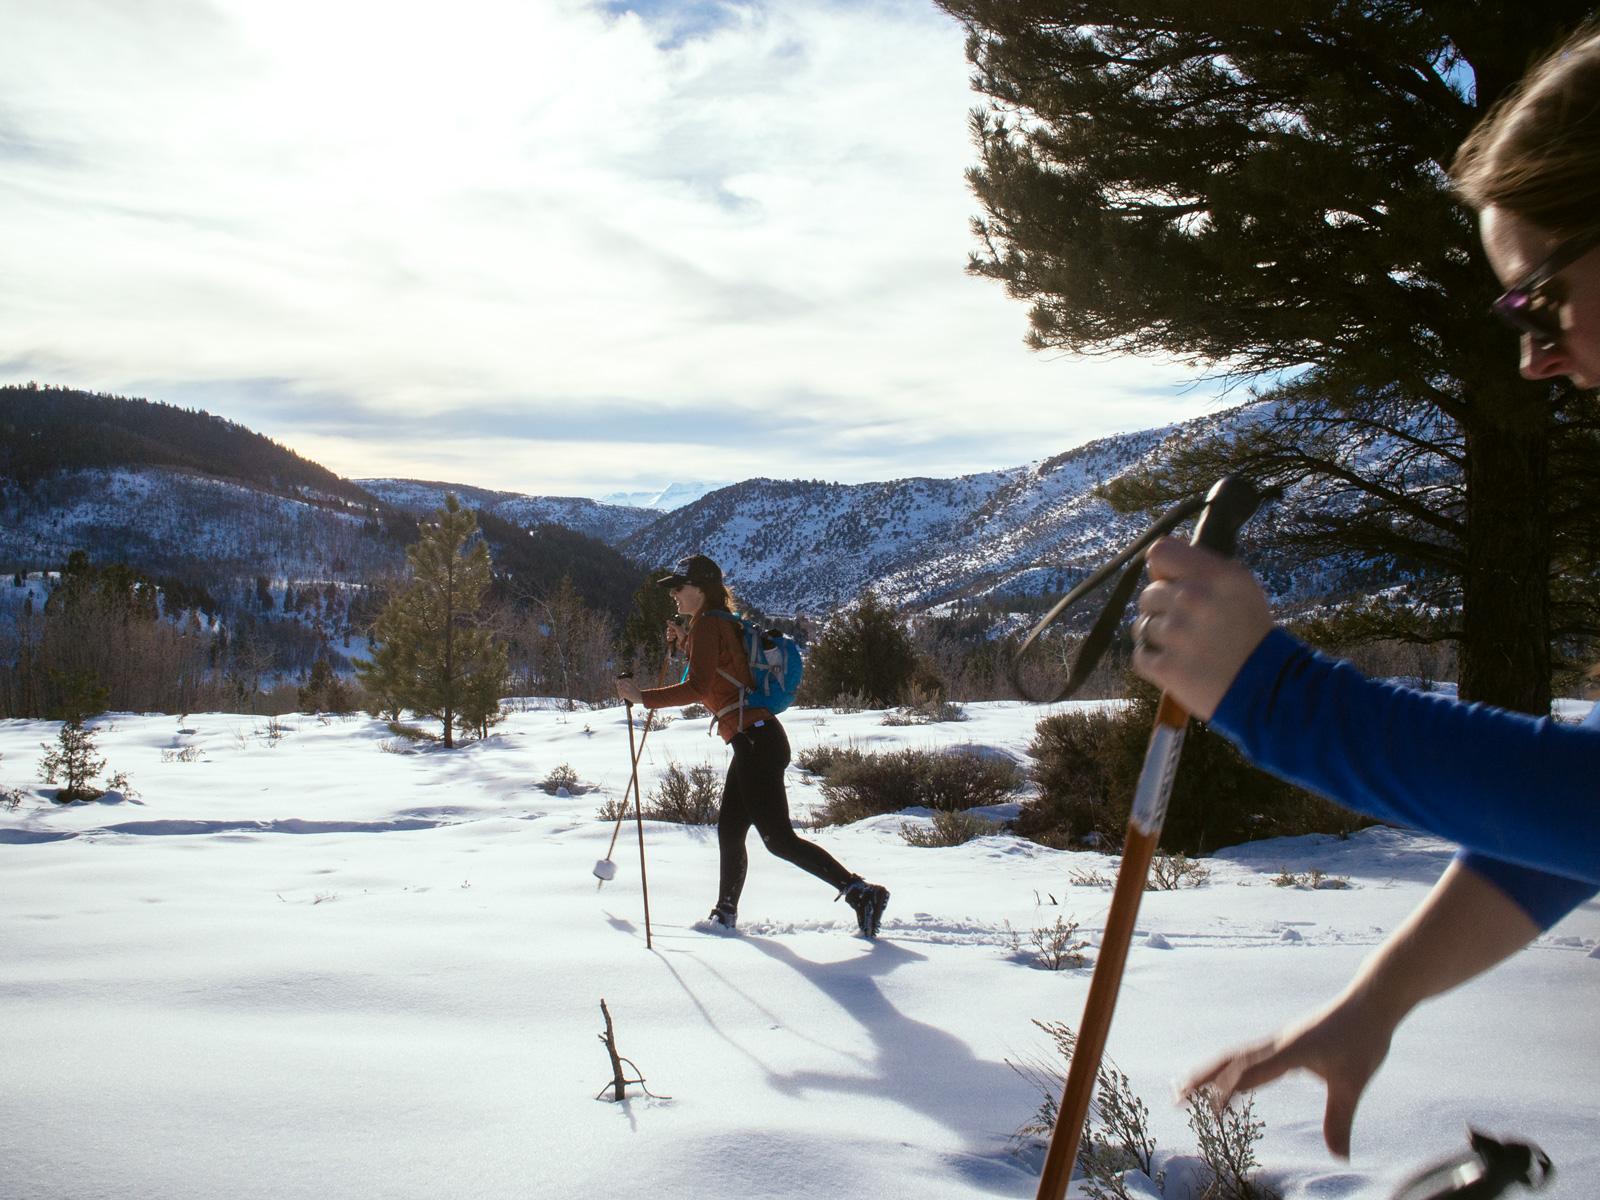 Timpanogos Back Drop - Uinta XC Ski